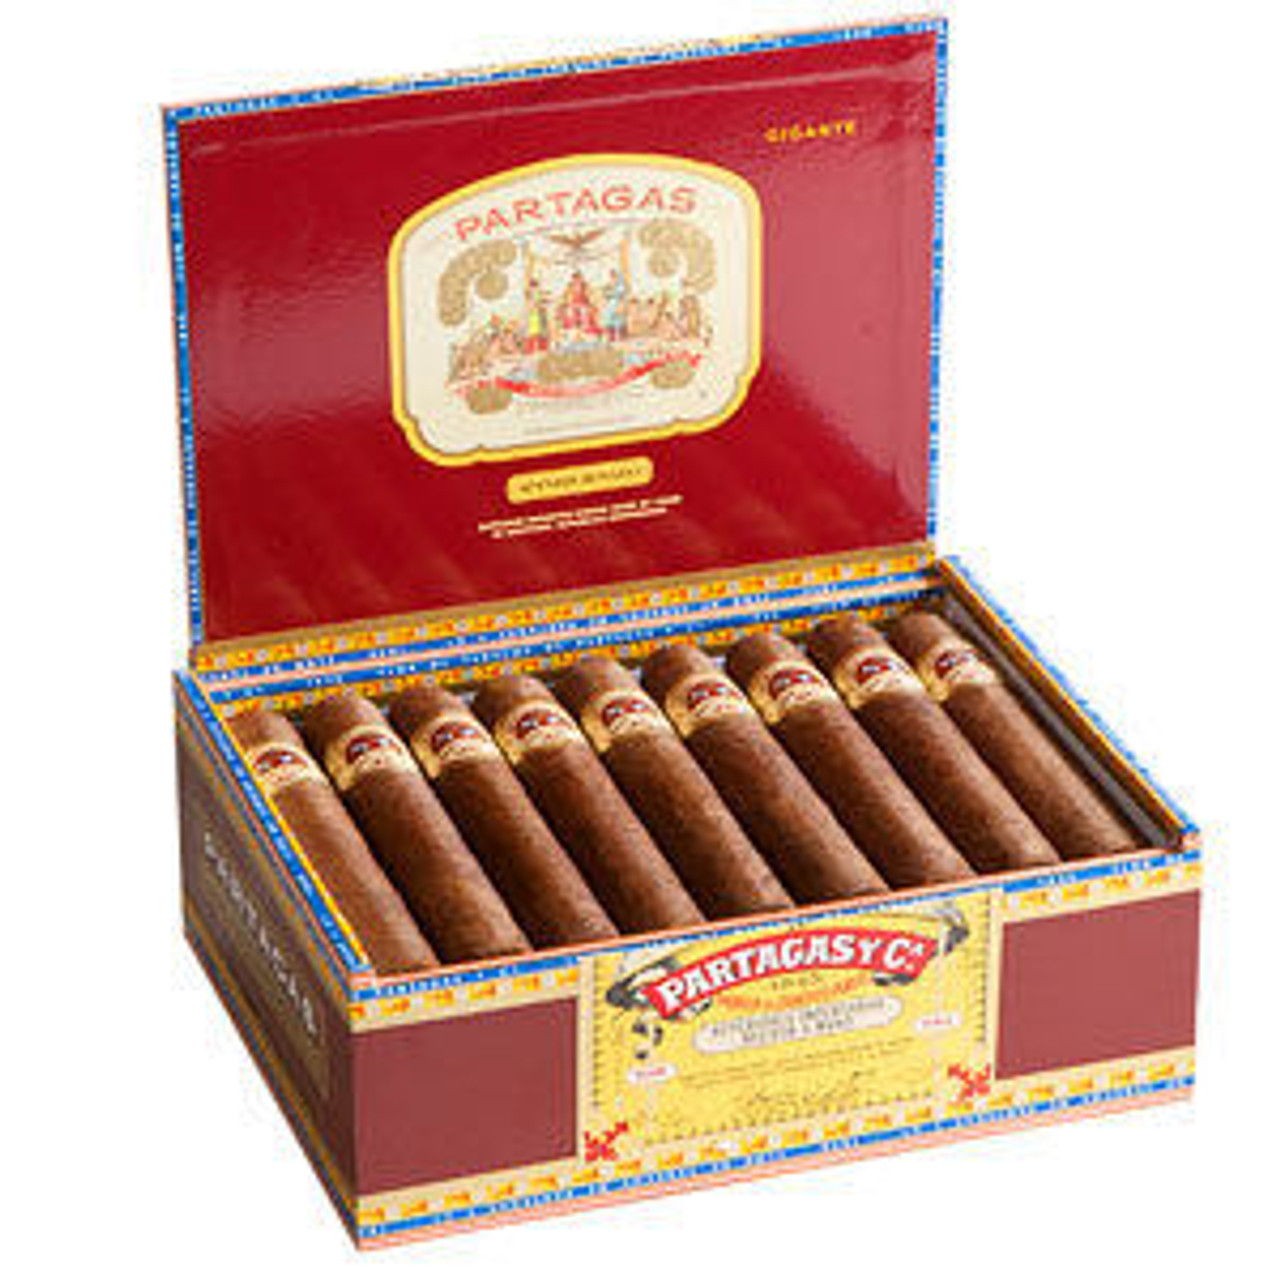 Partagas Spanish Rosado Mitico Cigars - 7.0 x 49 (Box of 25)